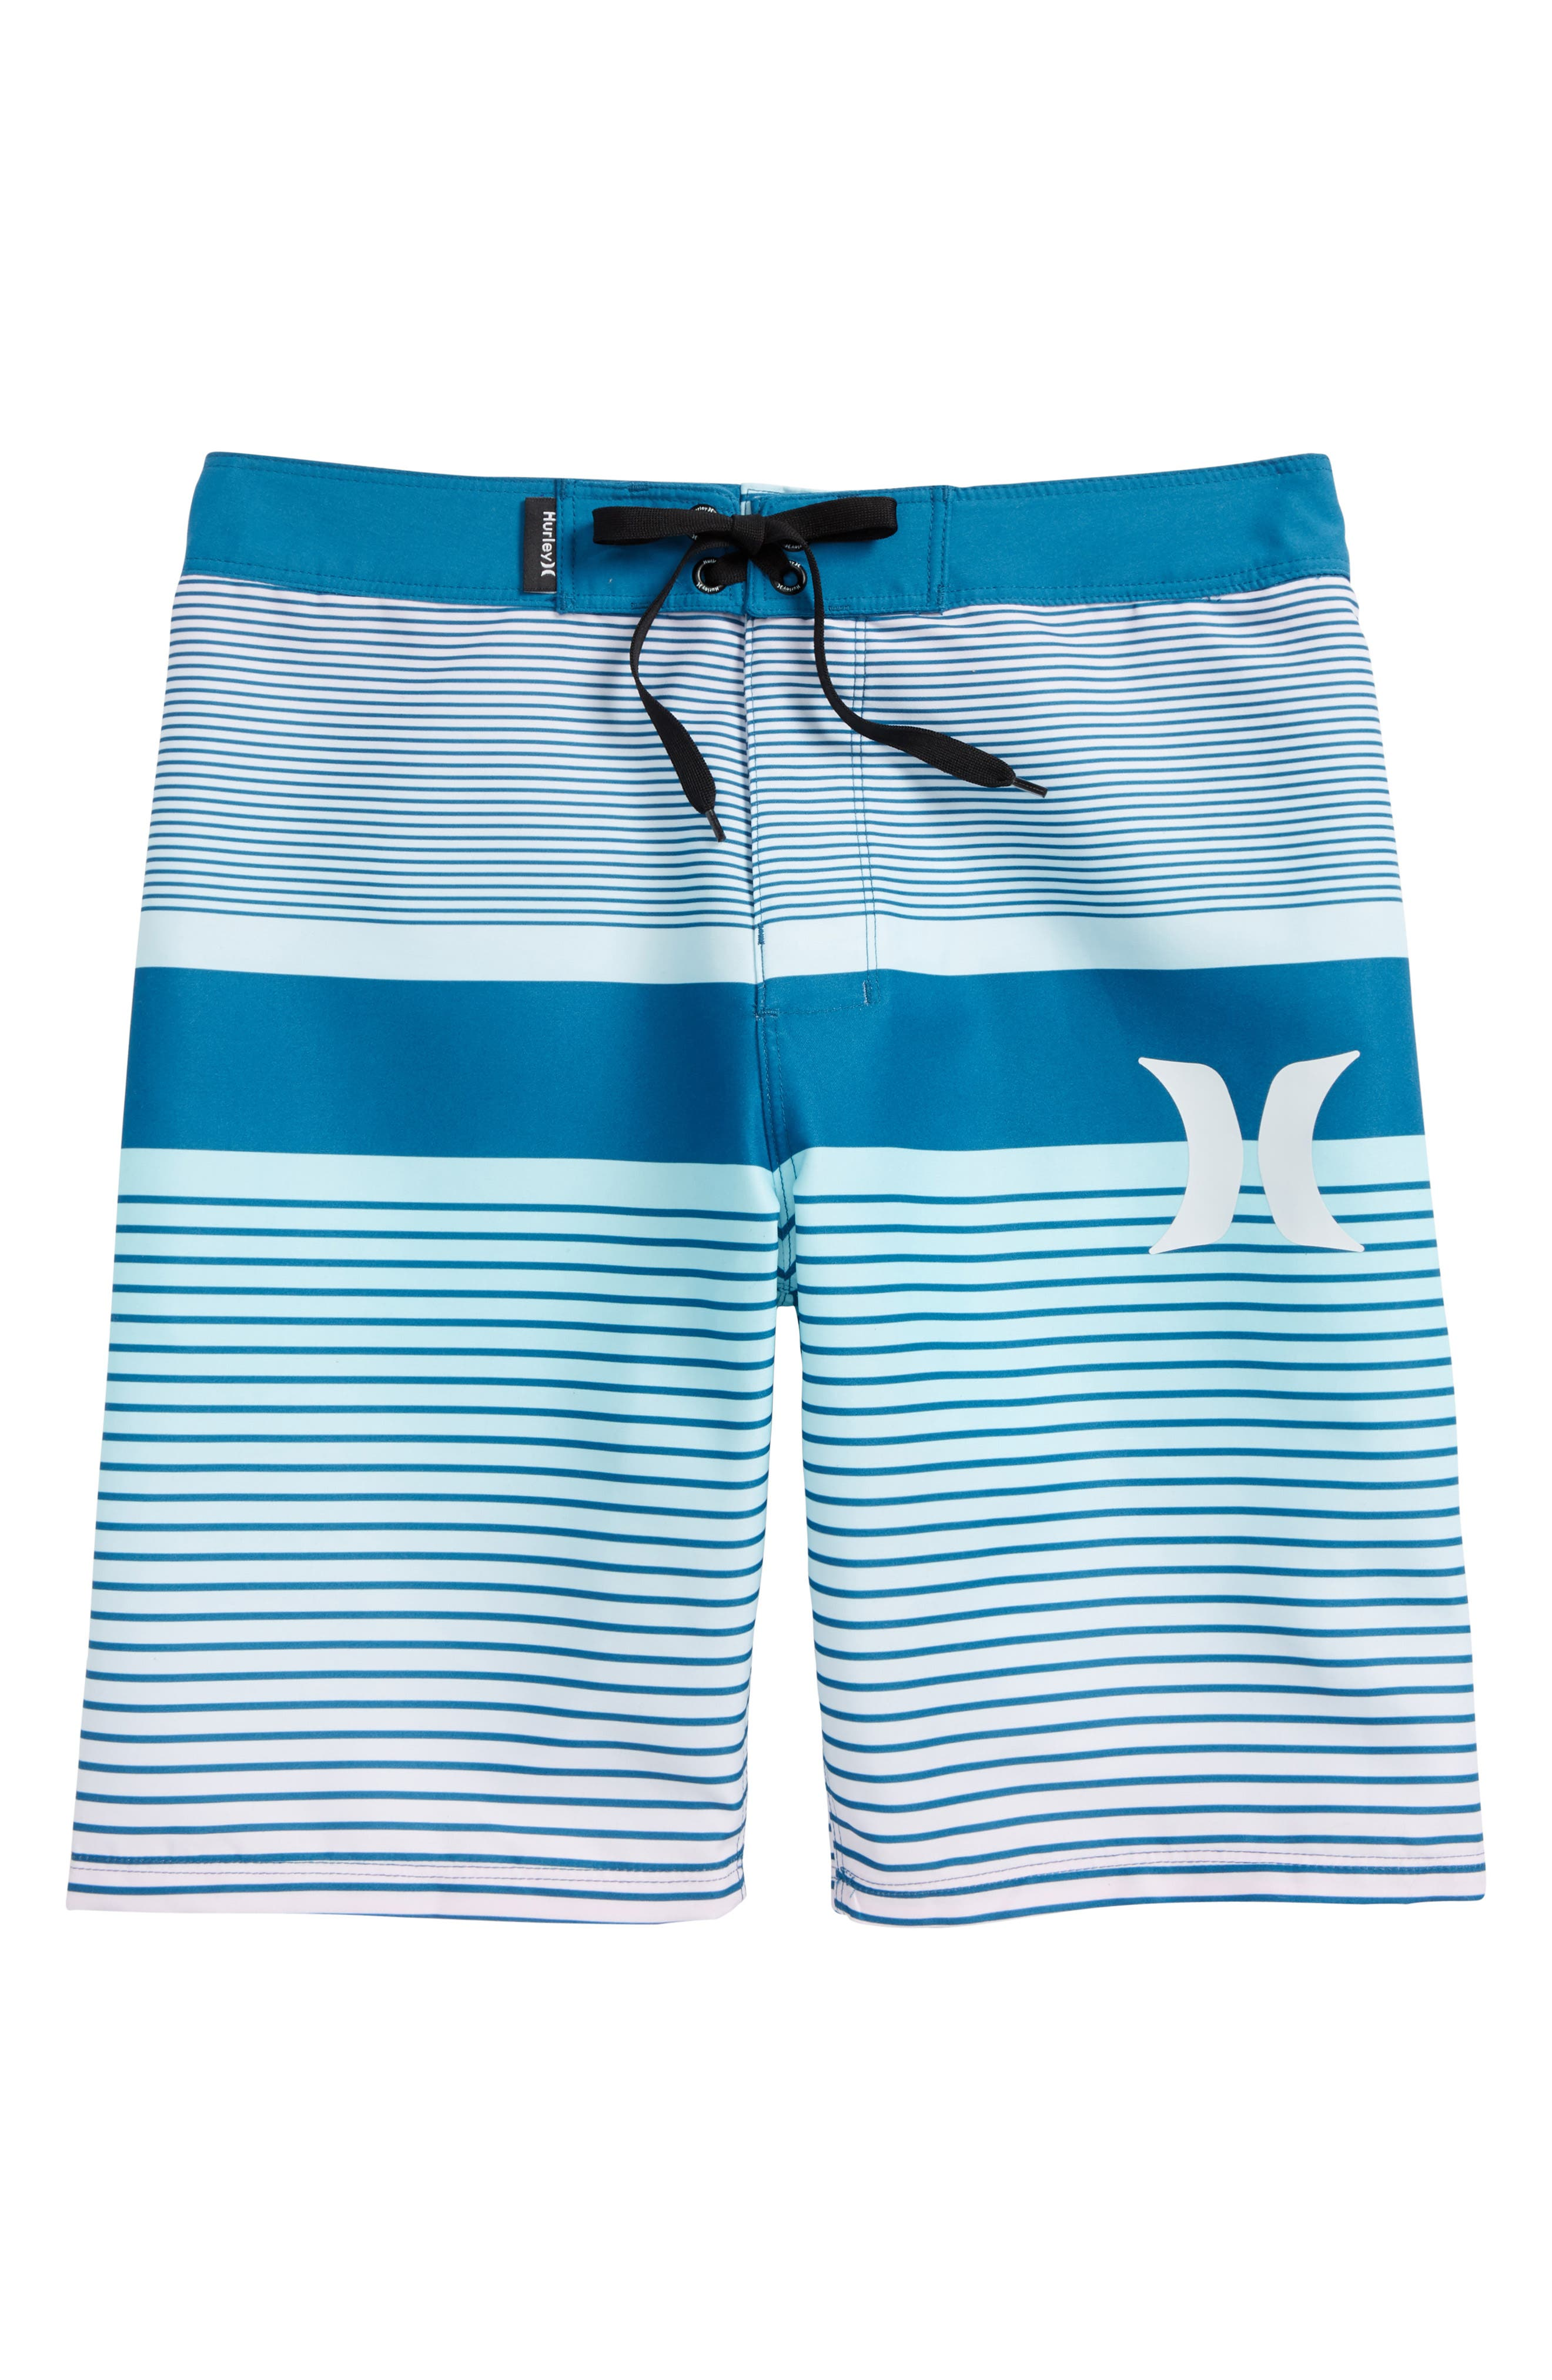 Line Up Board Shorts,                         Main,                         color, Rift Blue